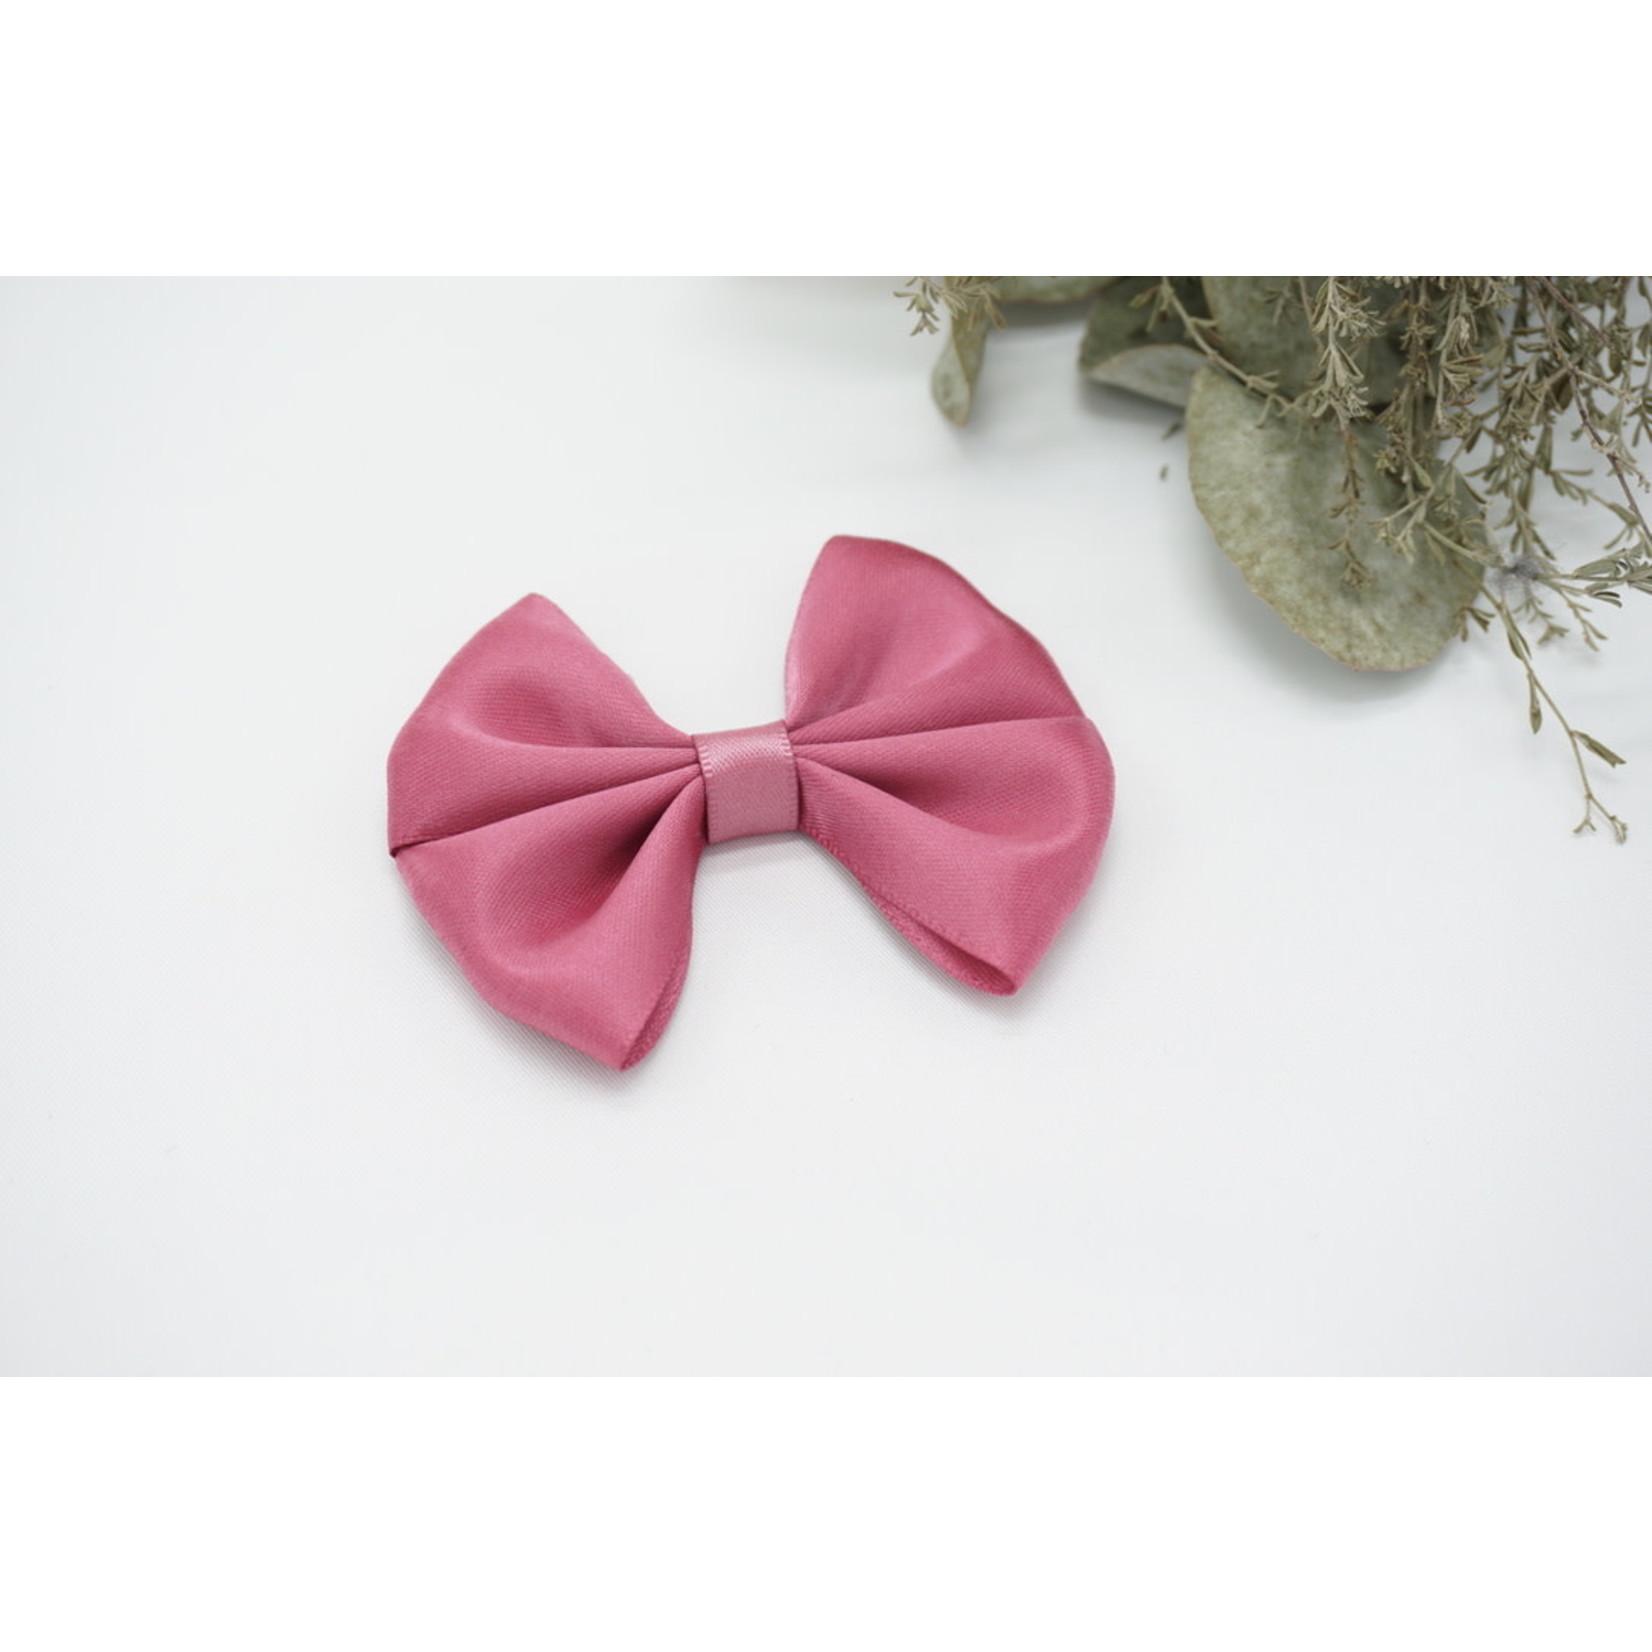 Petite Zara Satin Bow - Cassis